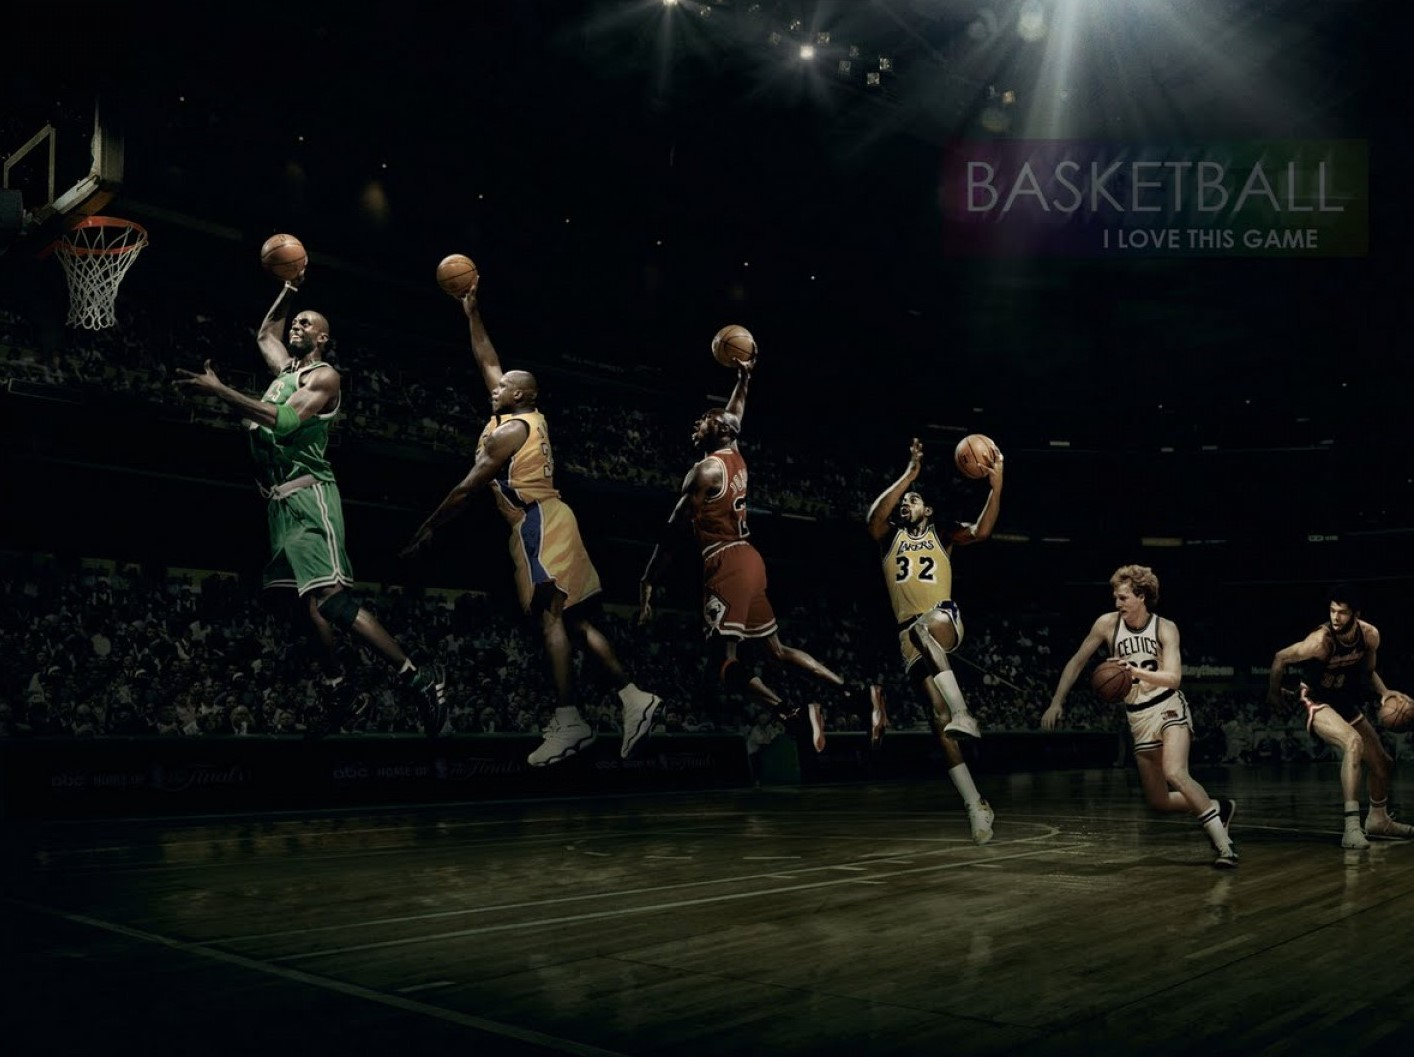 Basketball-Wallpapers-HD